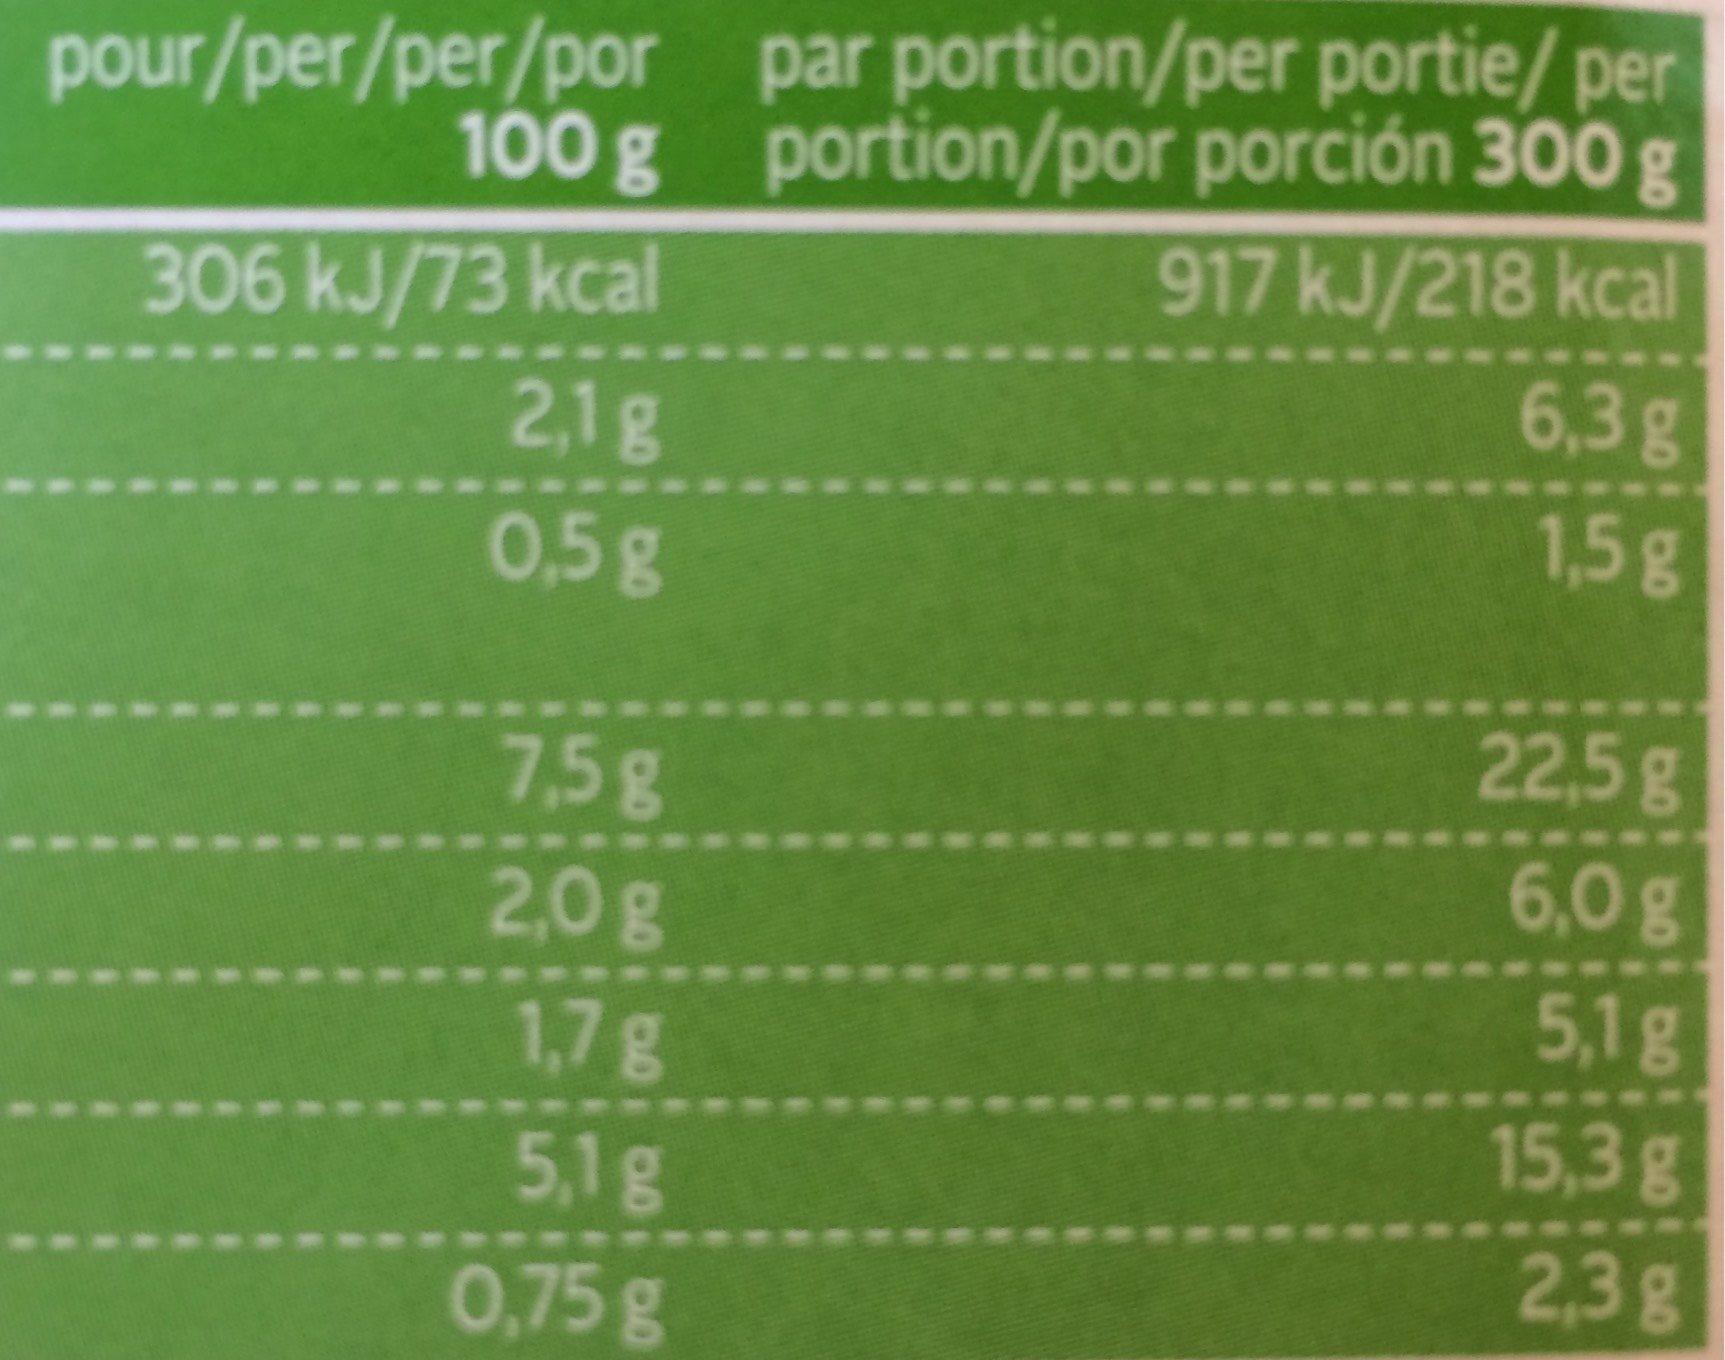 Beef a la provencale - Voedingswaarden - fr